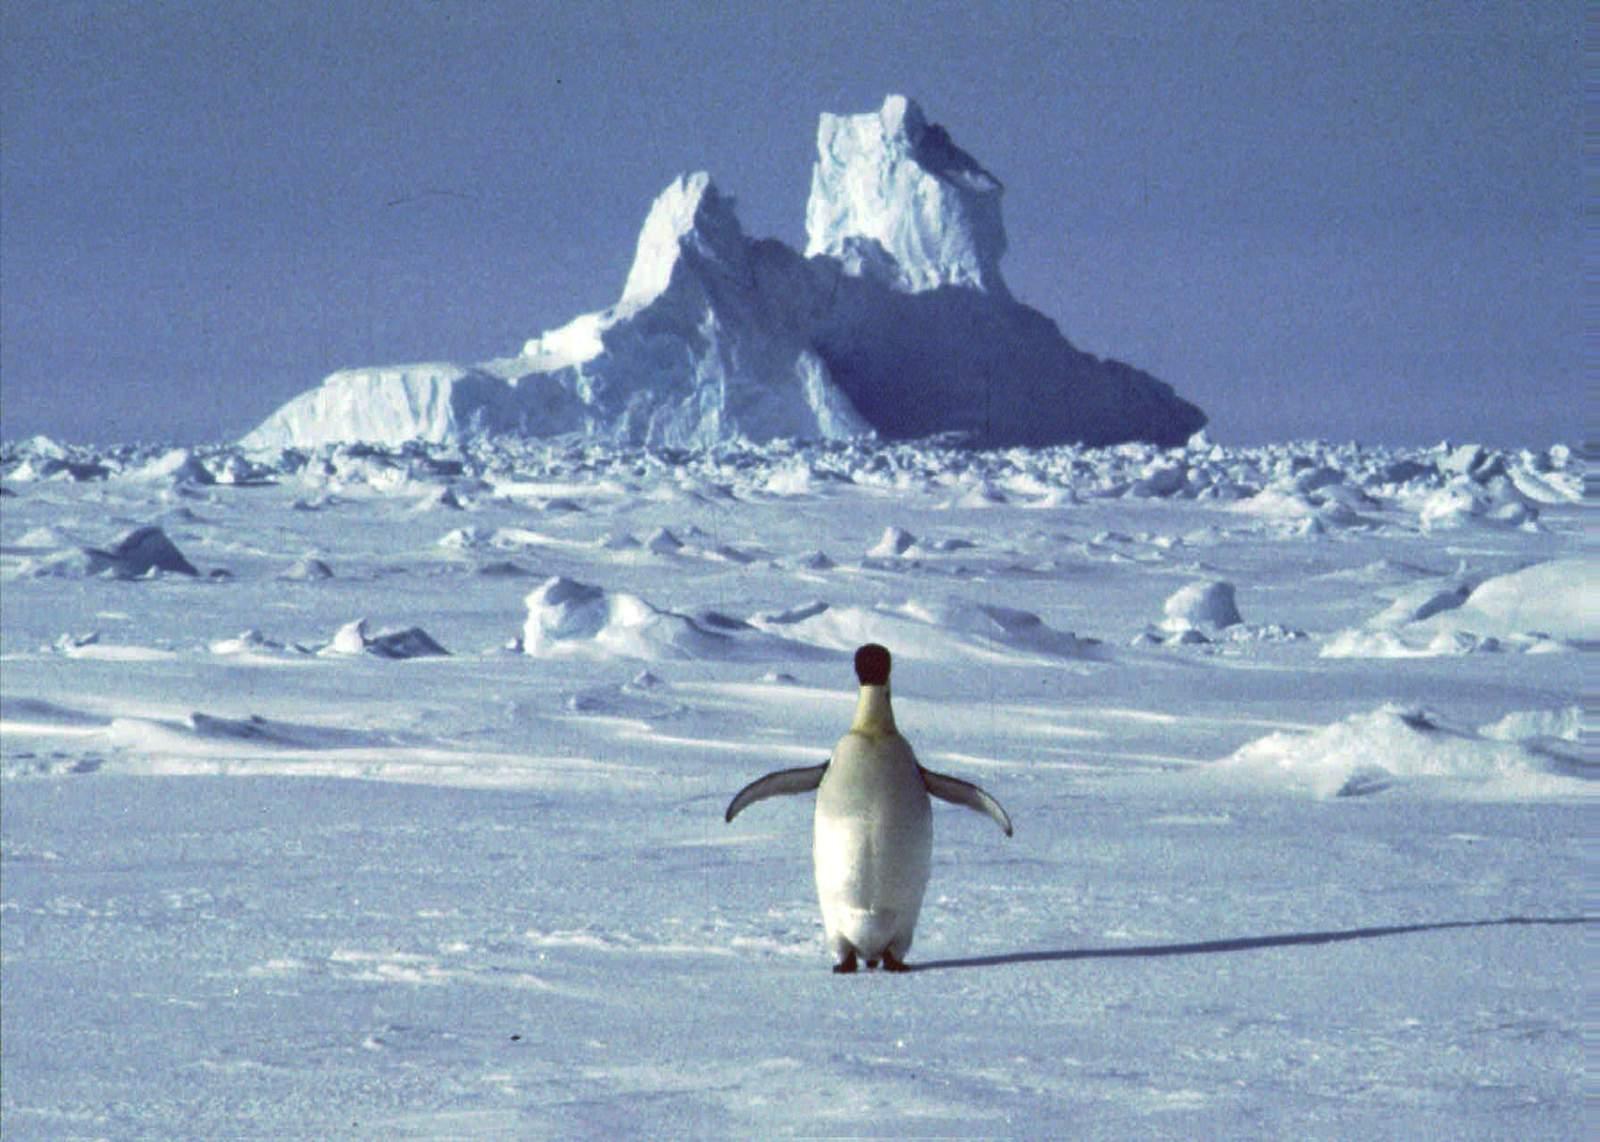 Keys to 2020: Antarctica 69.3°, Bernie in Nevada 46%, Union density 10.3%